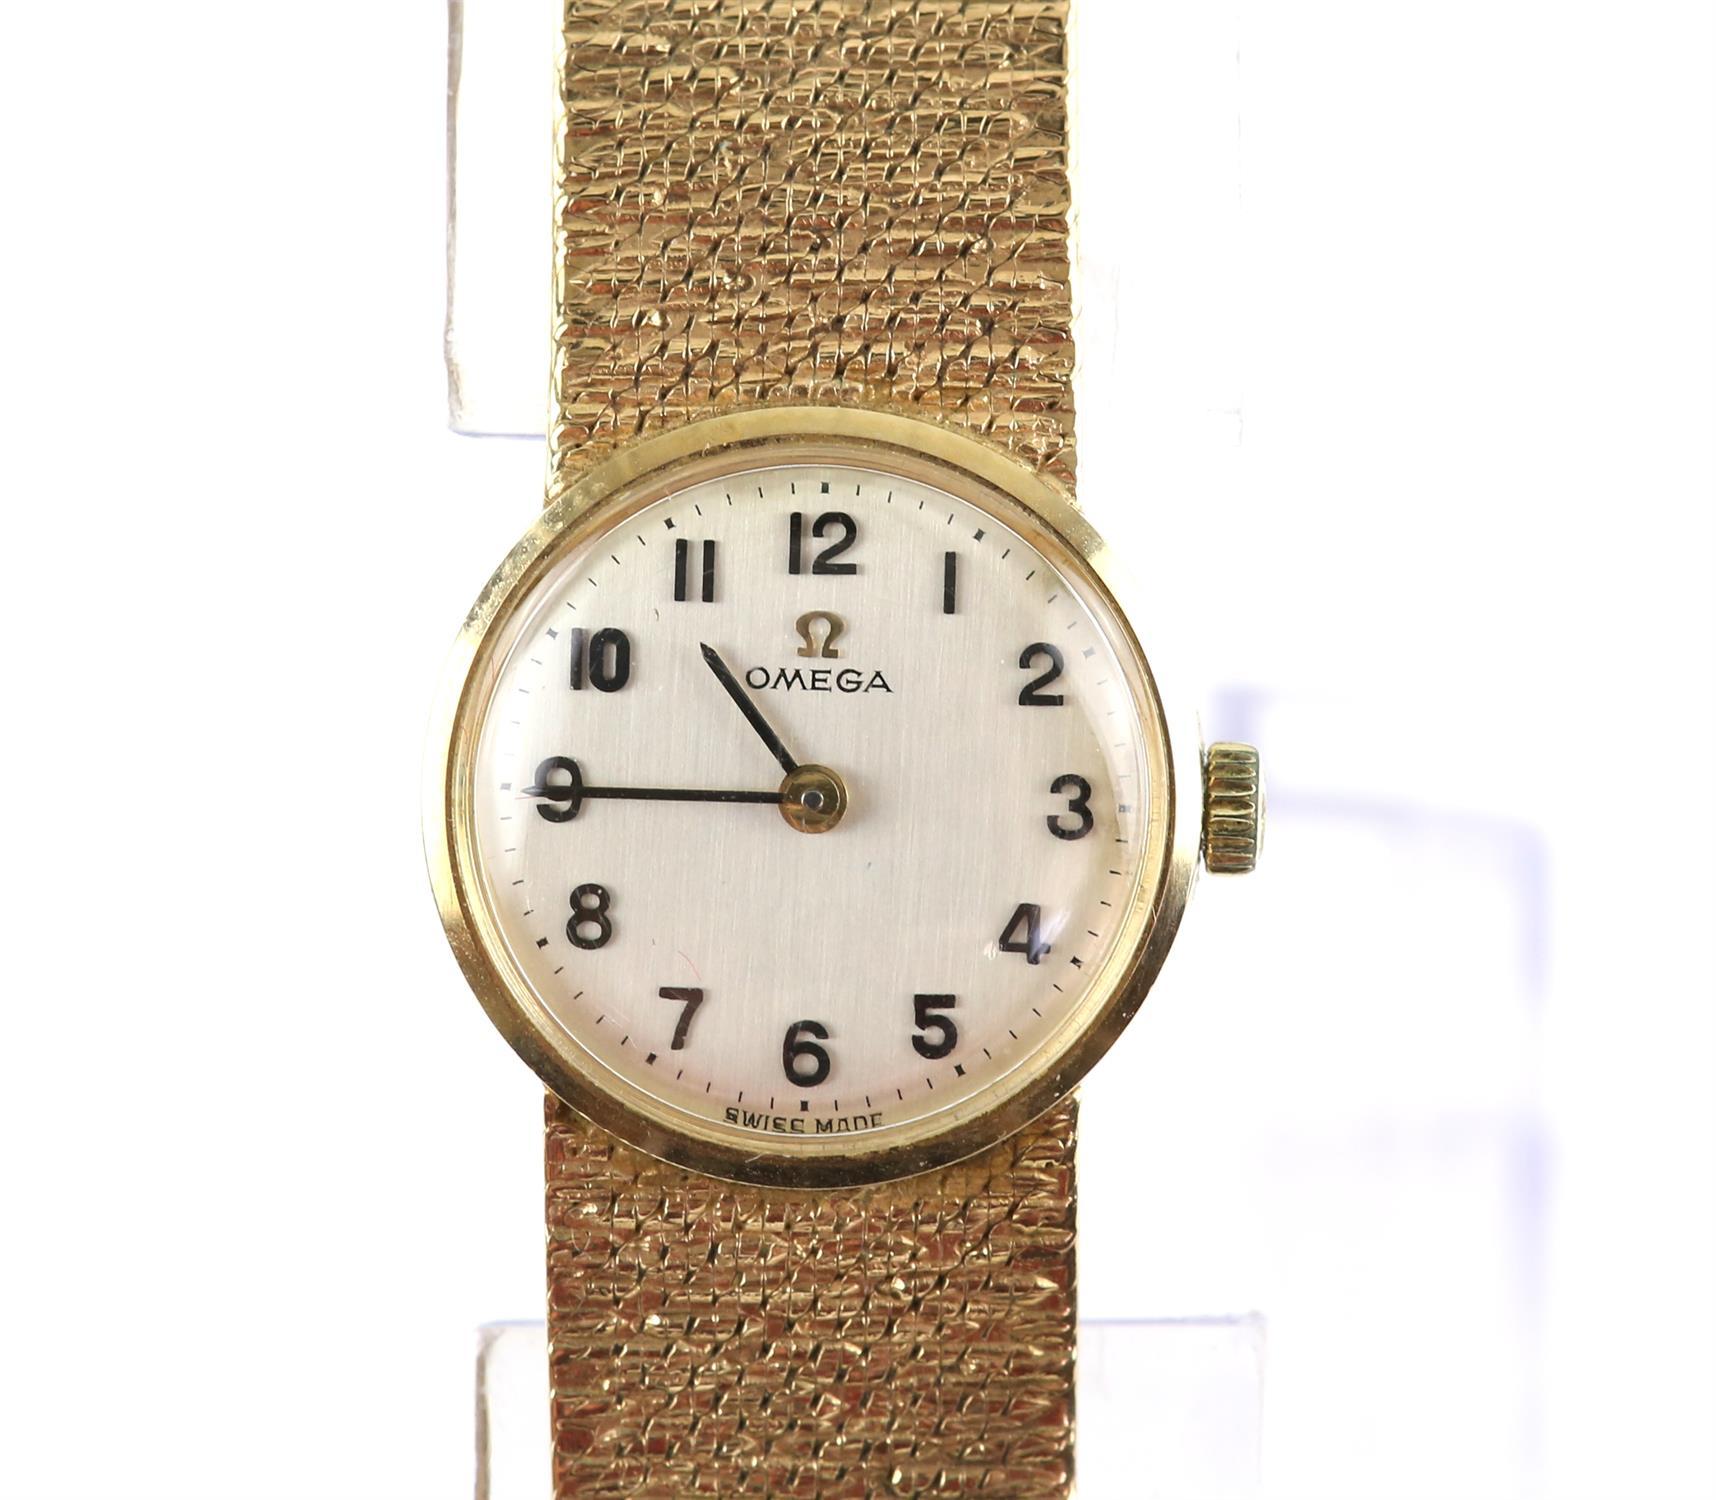 Vintage Omega watch, quartz movement, bracelet strap with textured bark finish, satin finish off